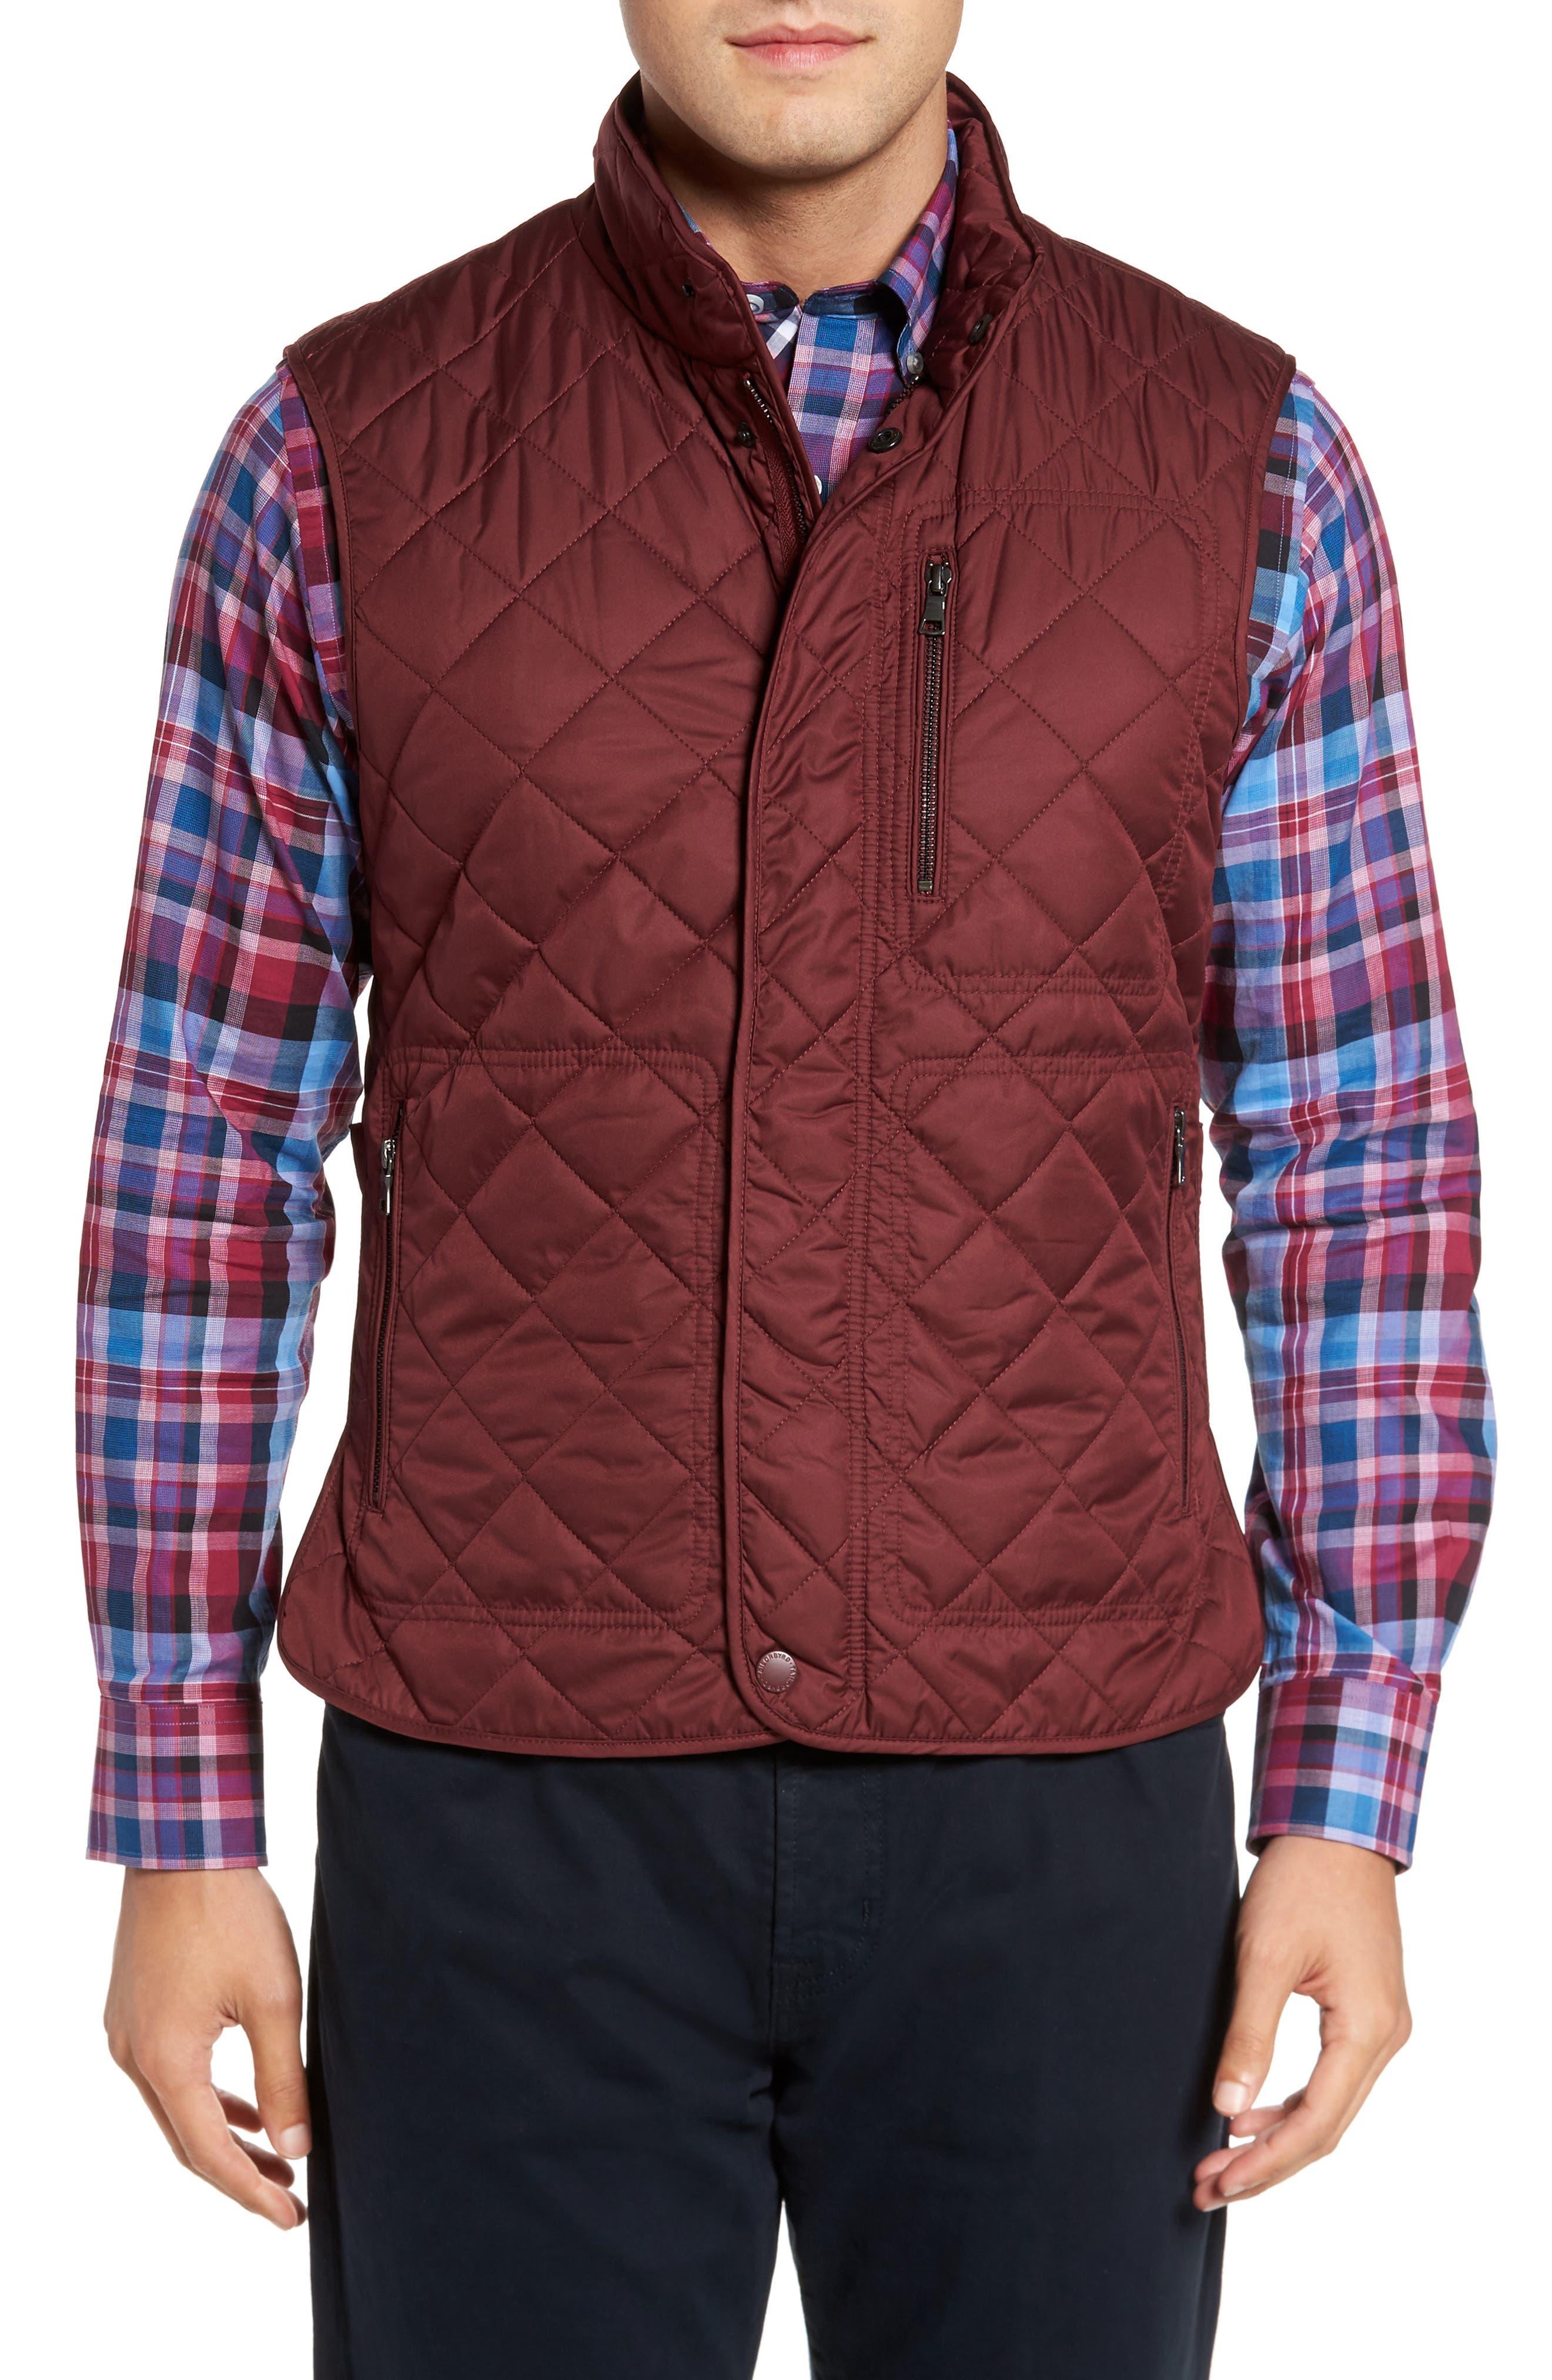 Main Image - TailorByrd Hessmer Quilted Vest